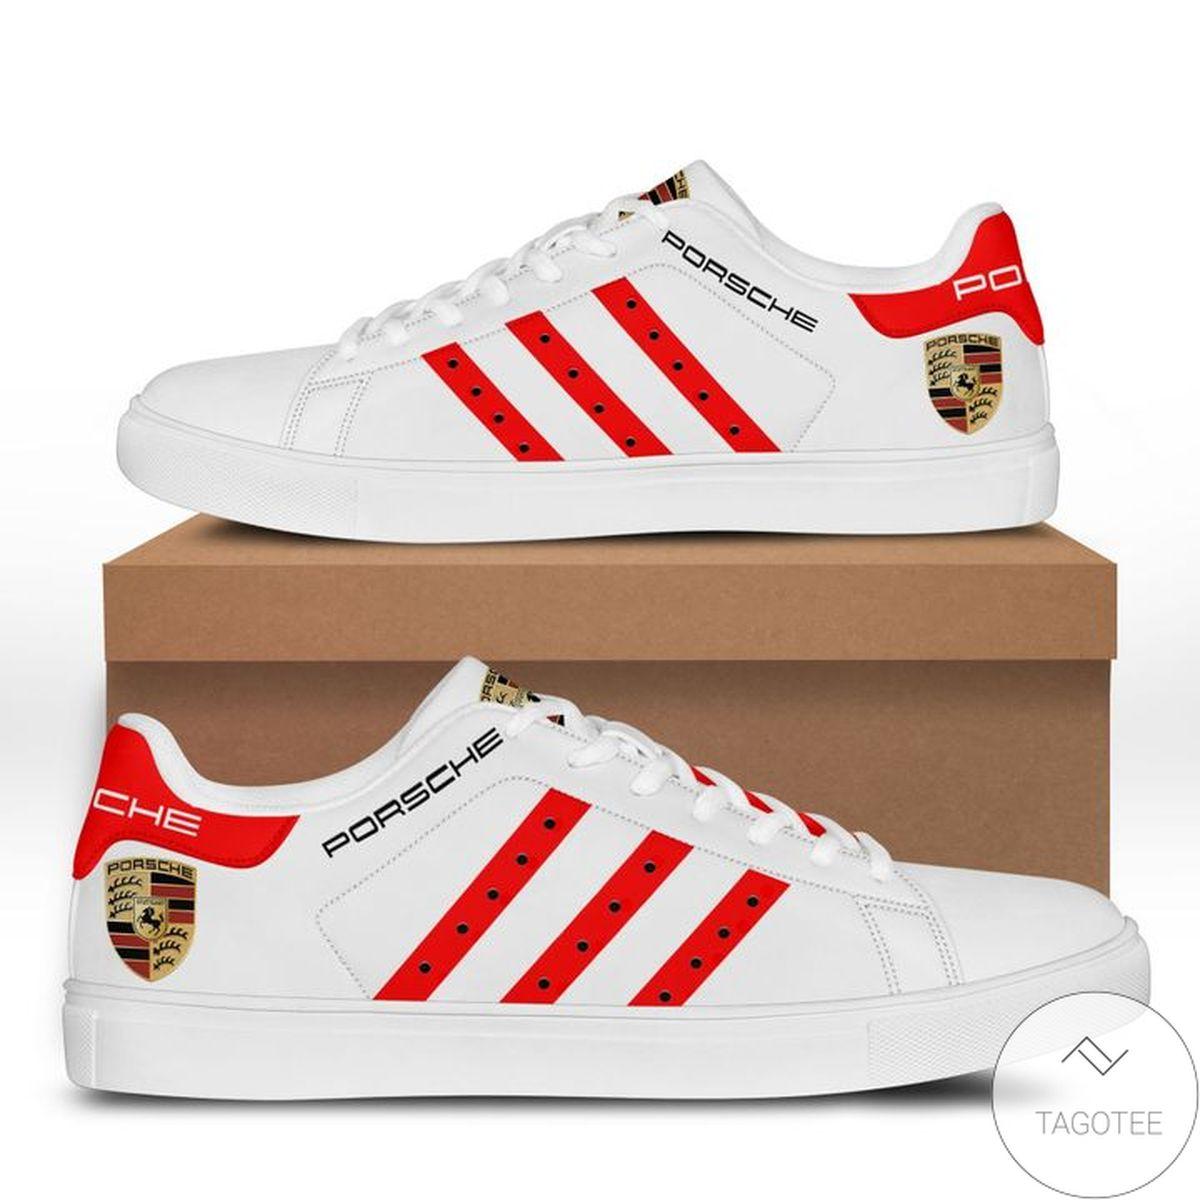 Hot Porsche White Red Stan Smith Shoes